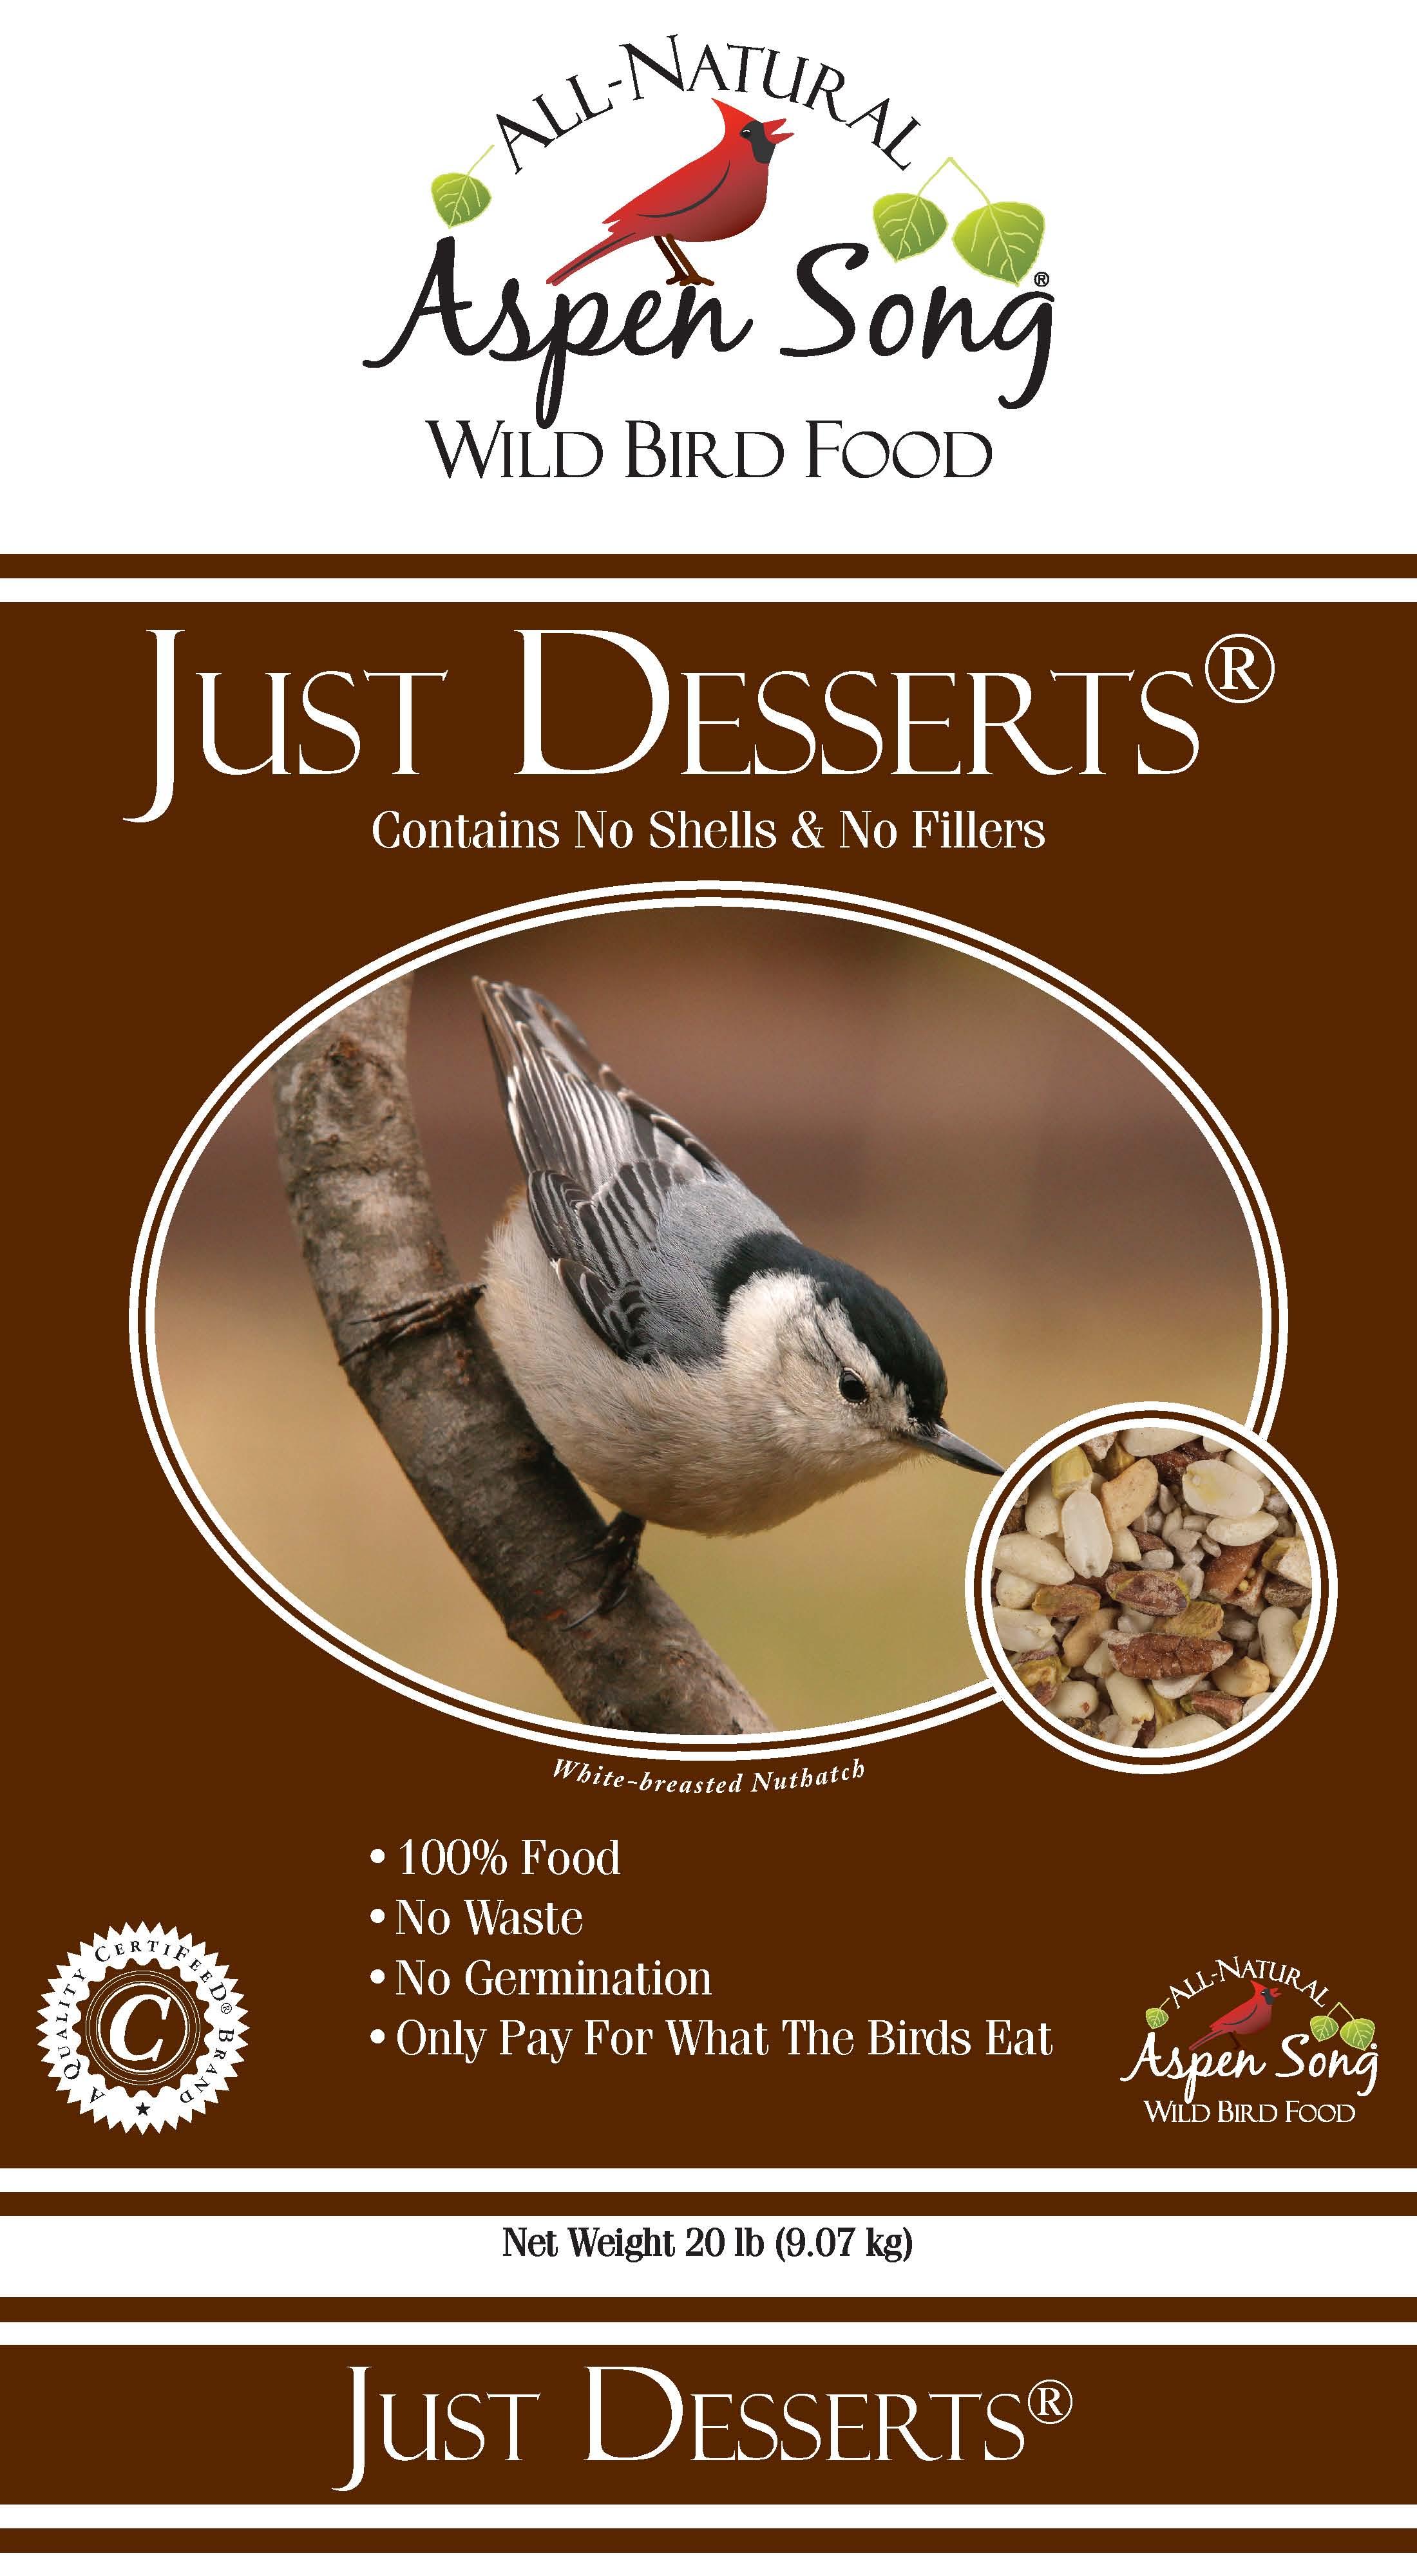 Just_Desserts_20lb.jpg